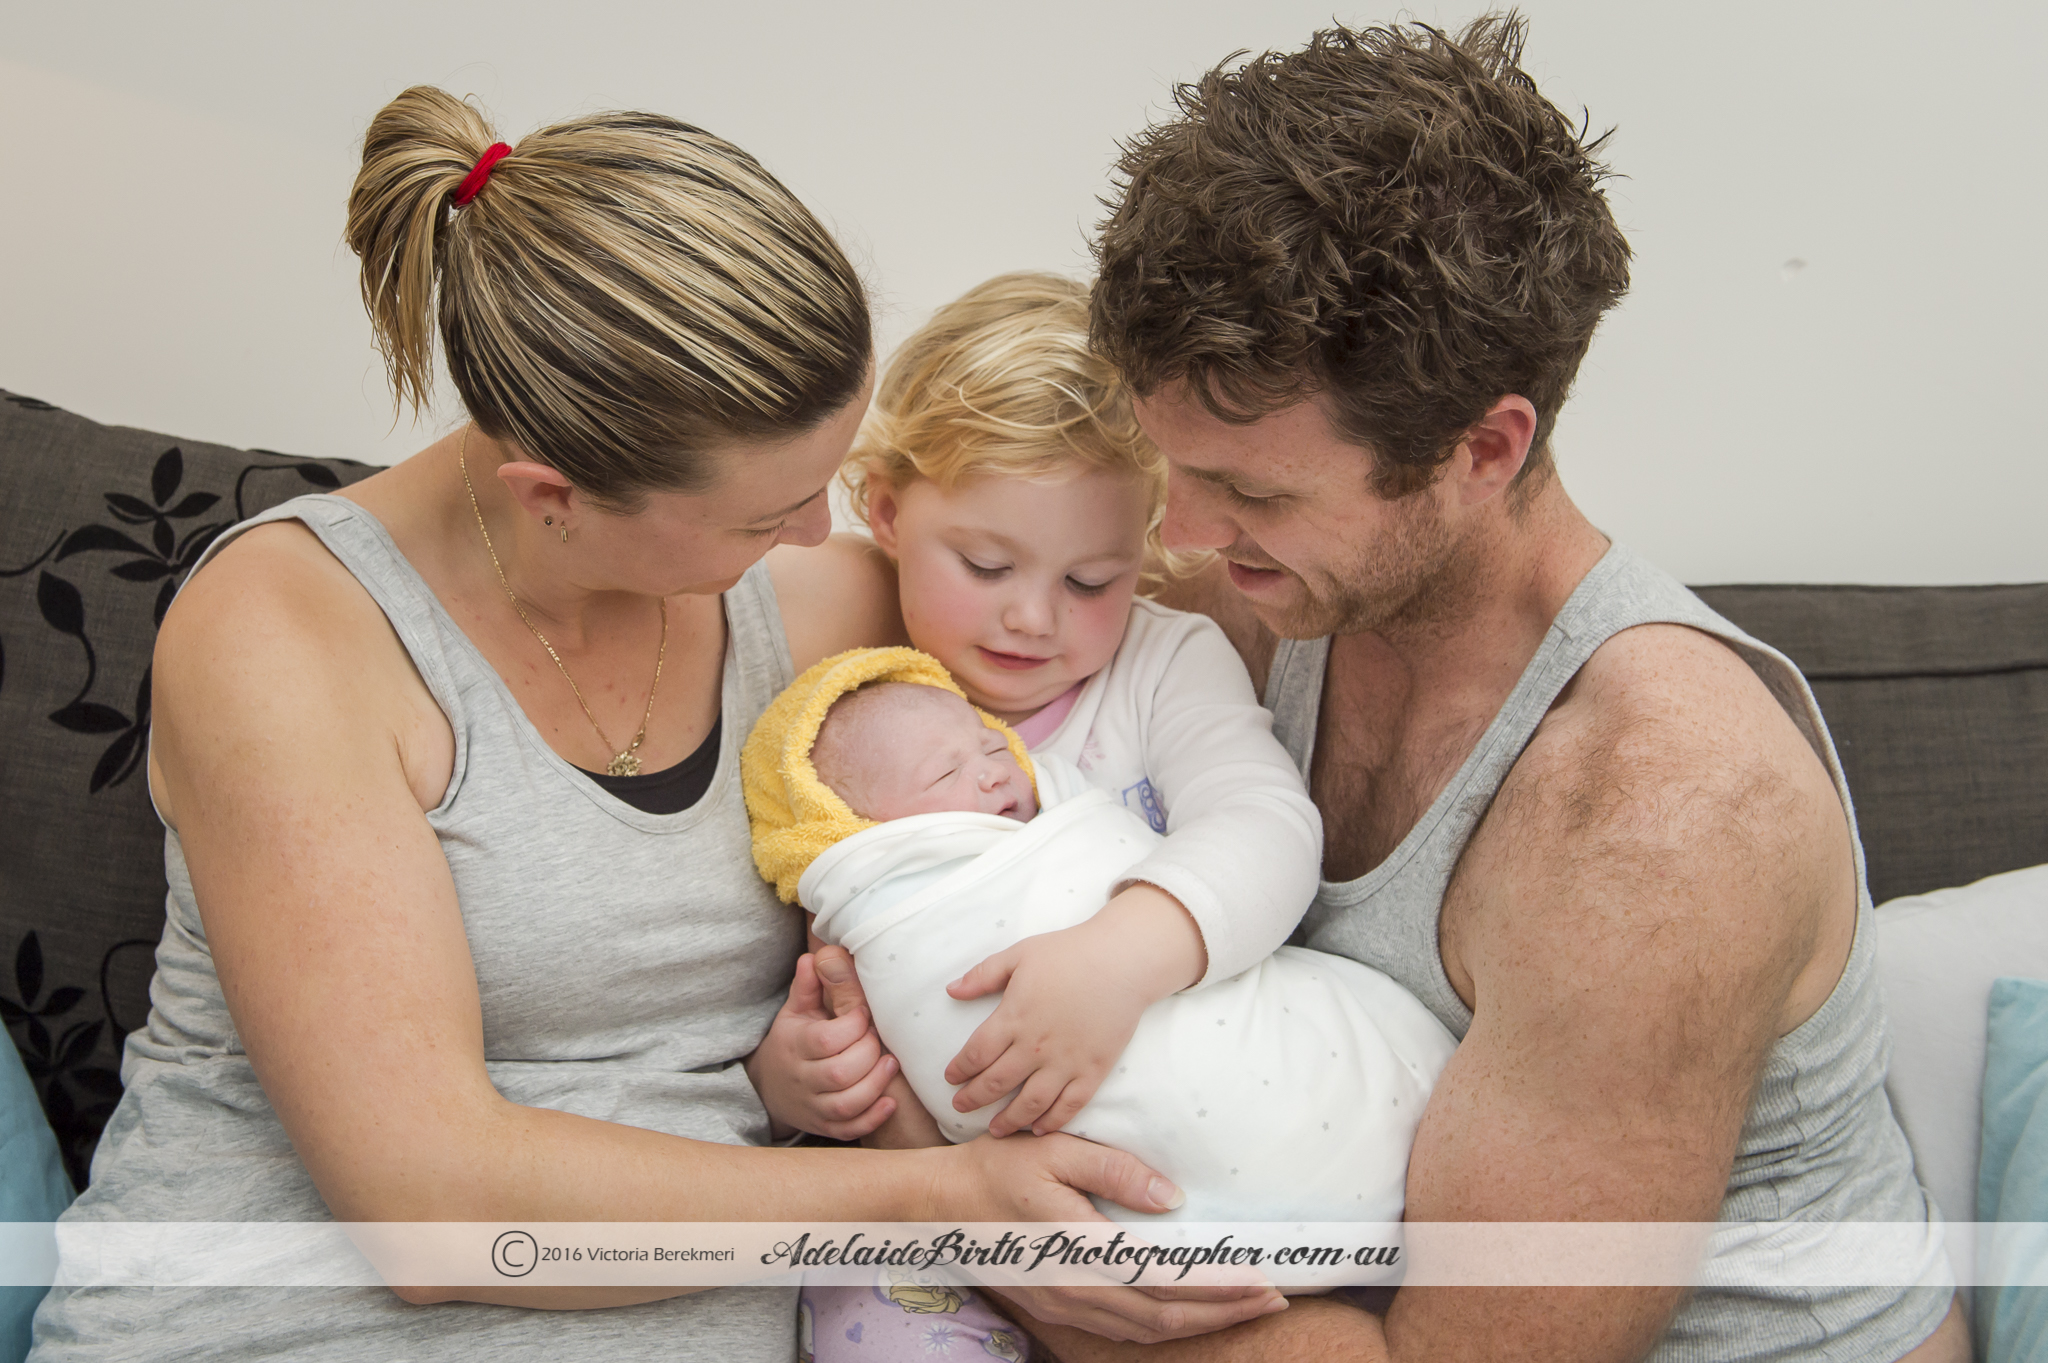 All professional photo credits go to the amazing Victoria Berekmeri from Adelaide Birth Photographer